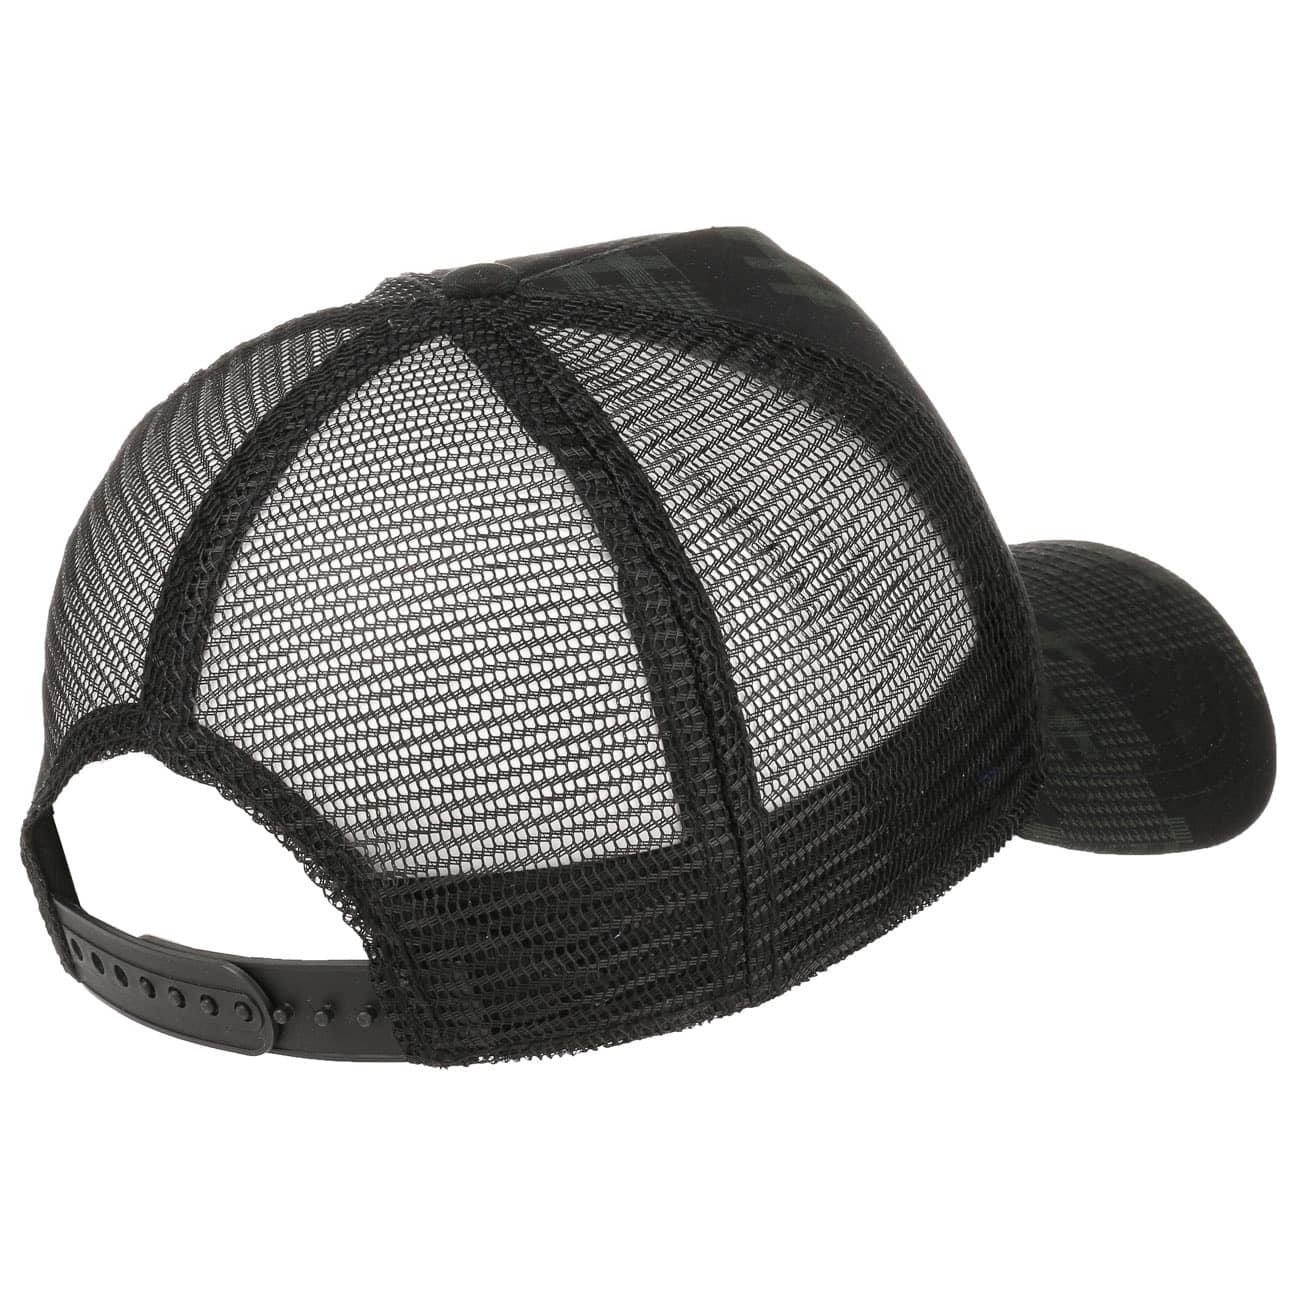 camou trucker cap by djinns gbp 17 95 hats caps. Black Bedroom Furniture Sets. Home Design Ideas